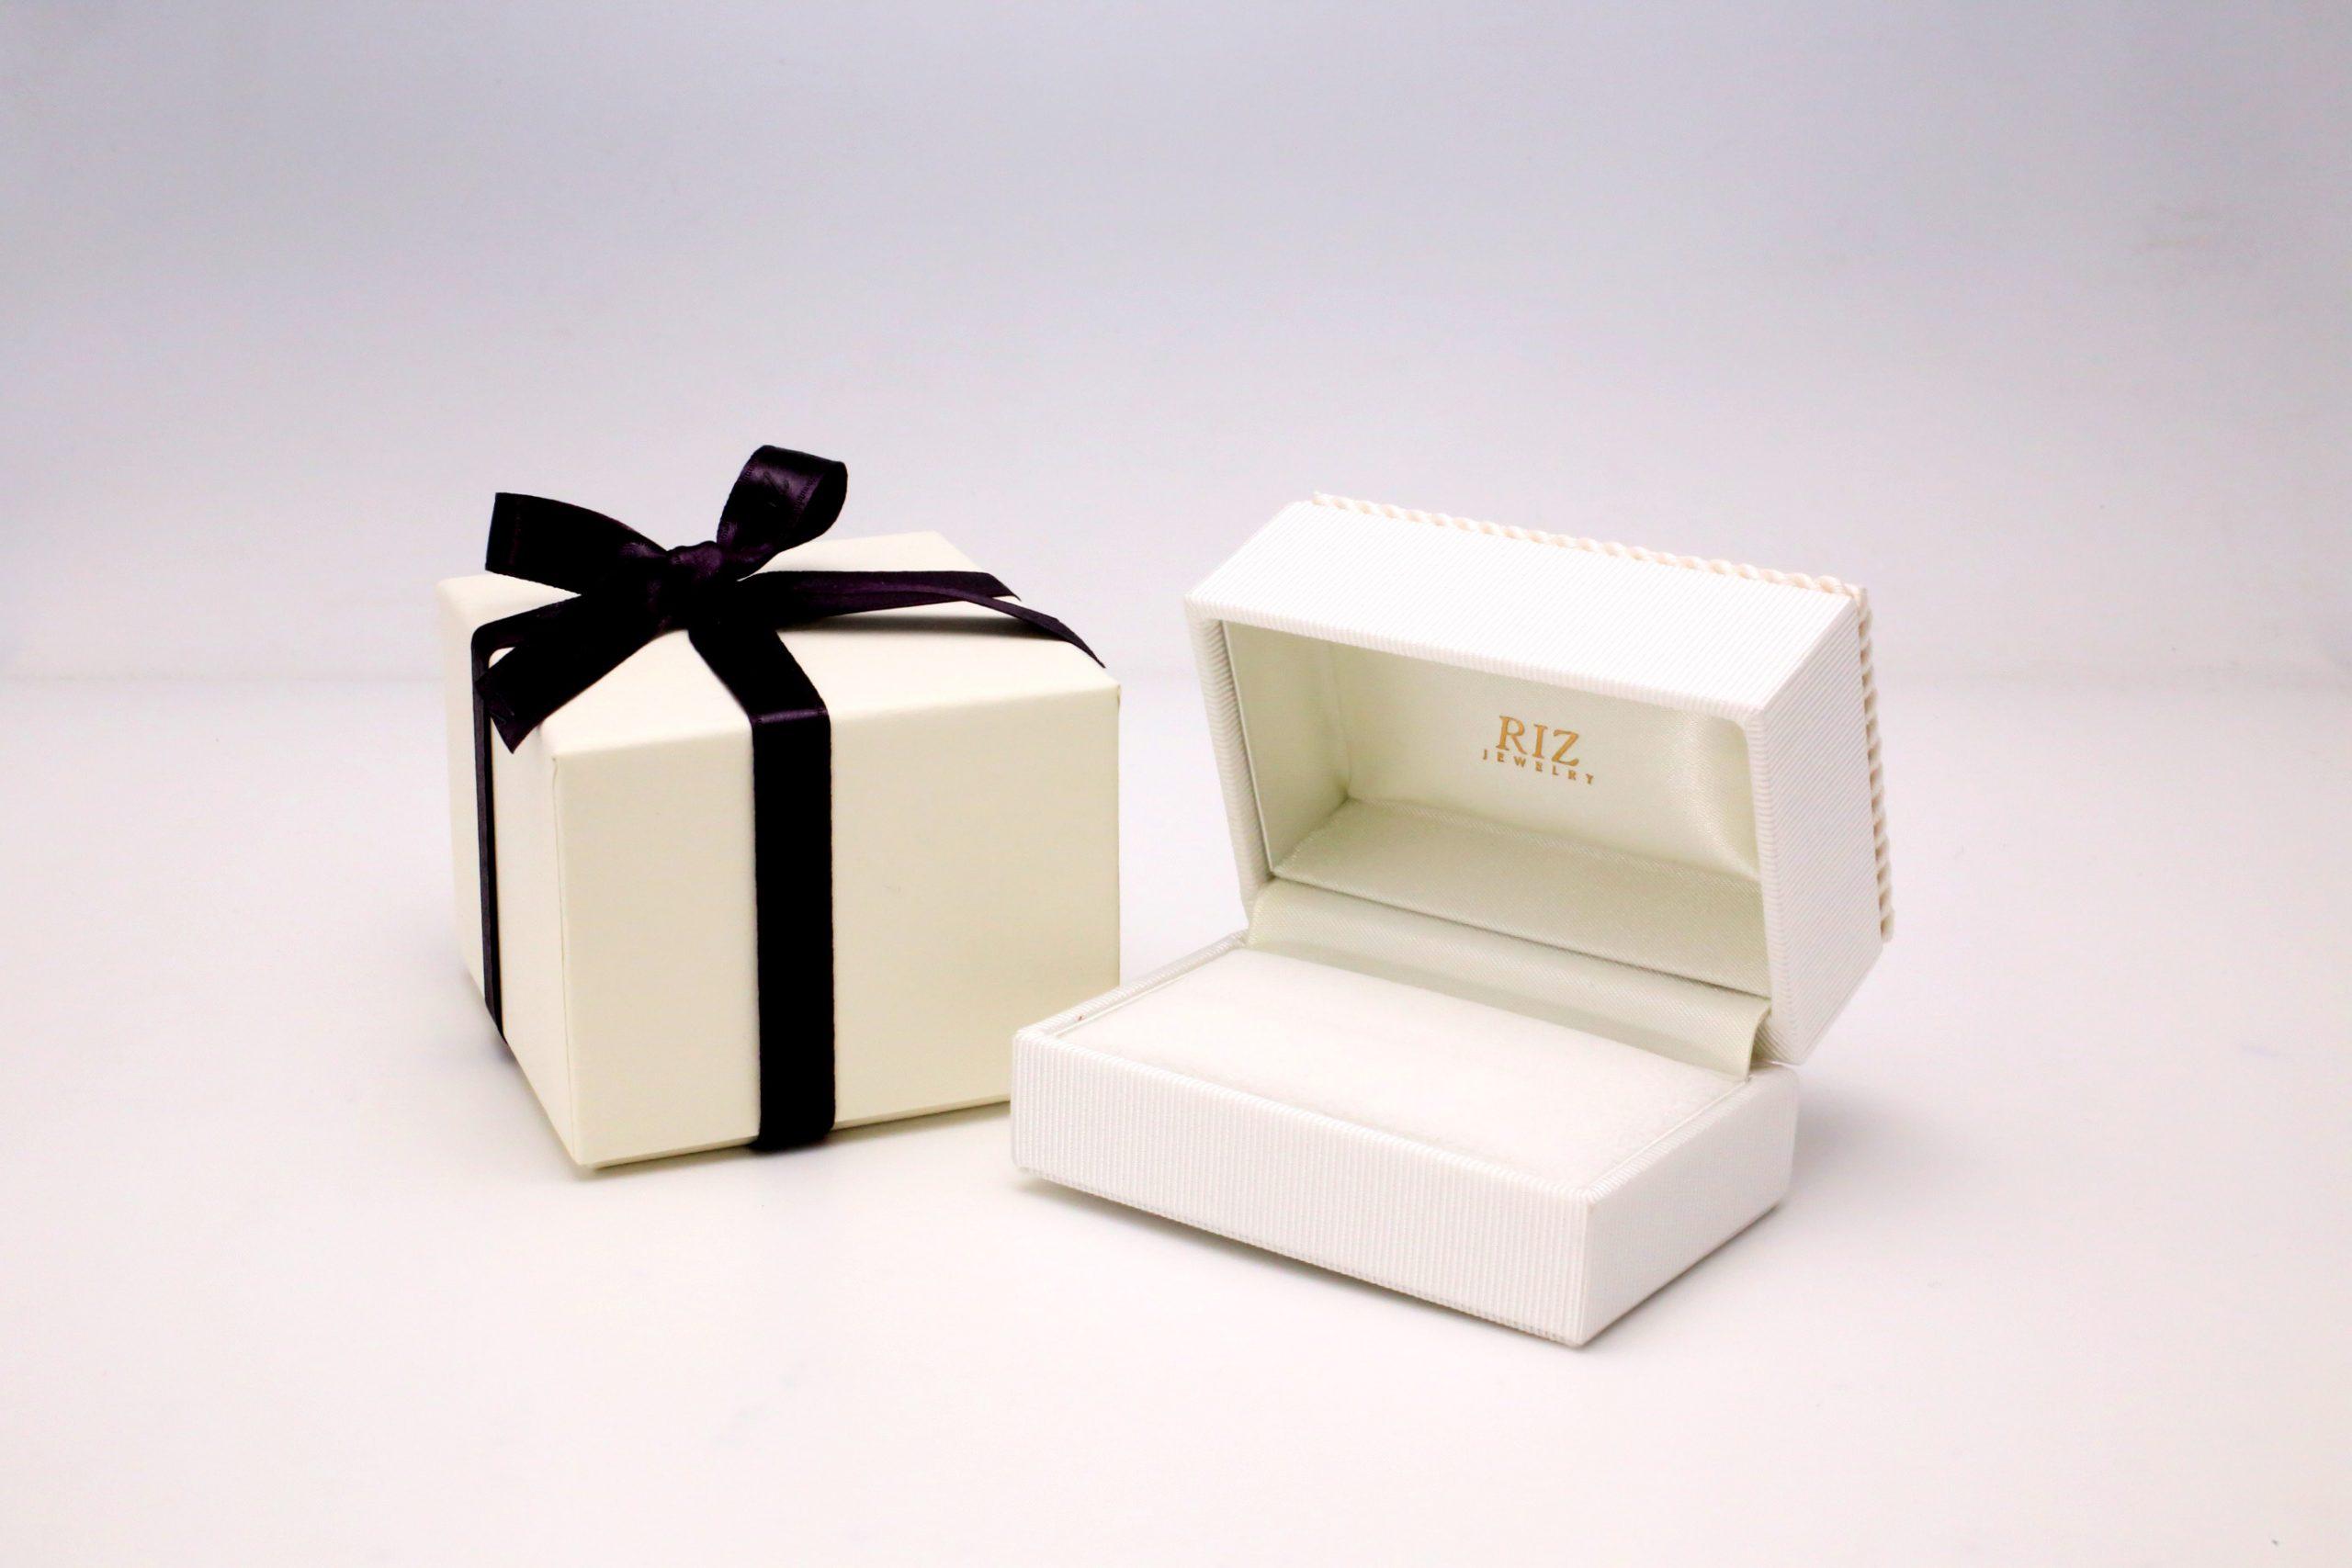 RIZ-bridal マリッジ・ペアリングケース